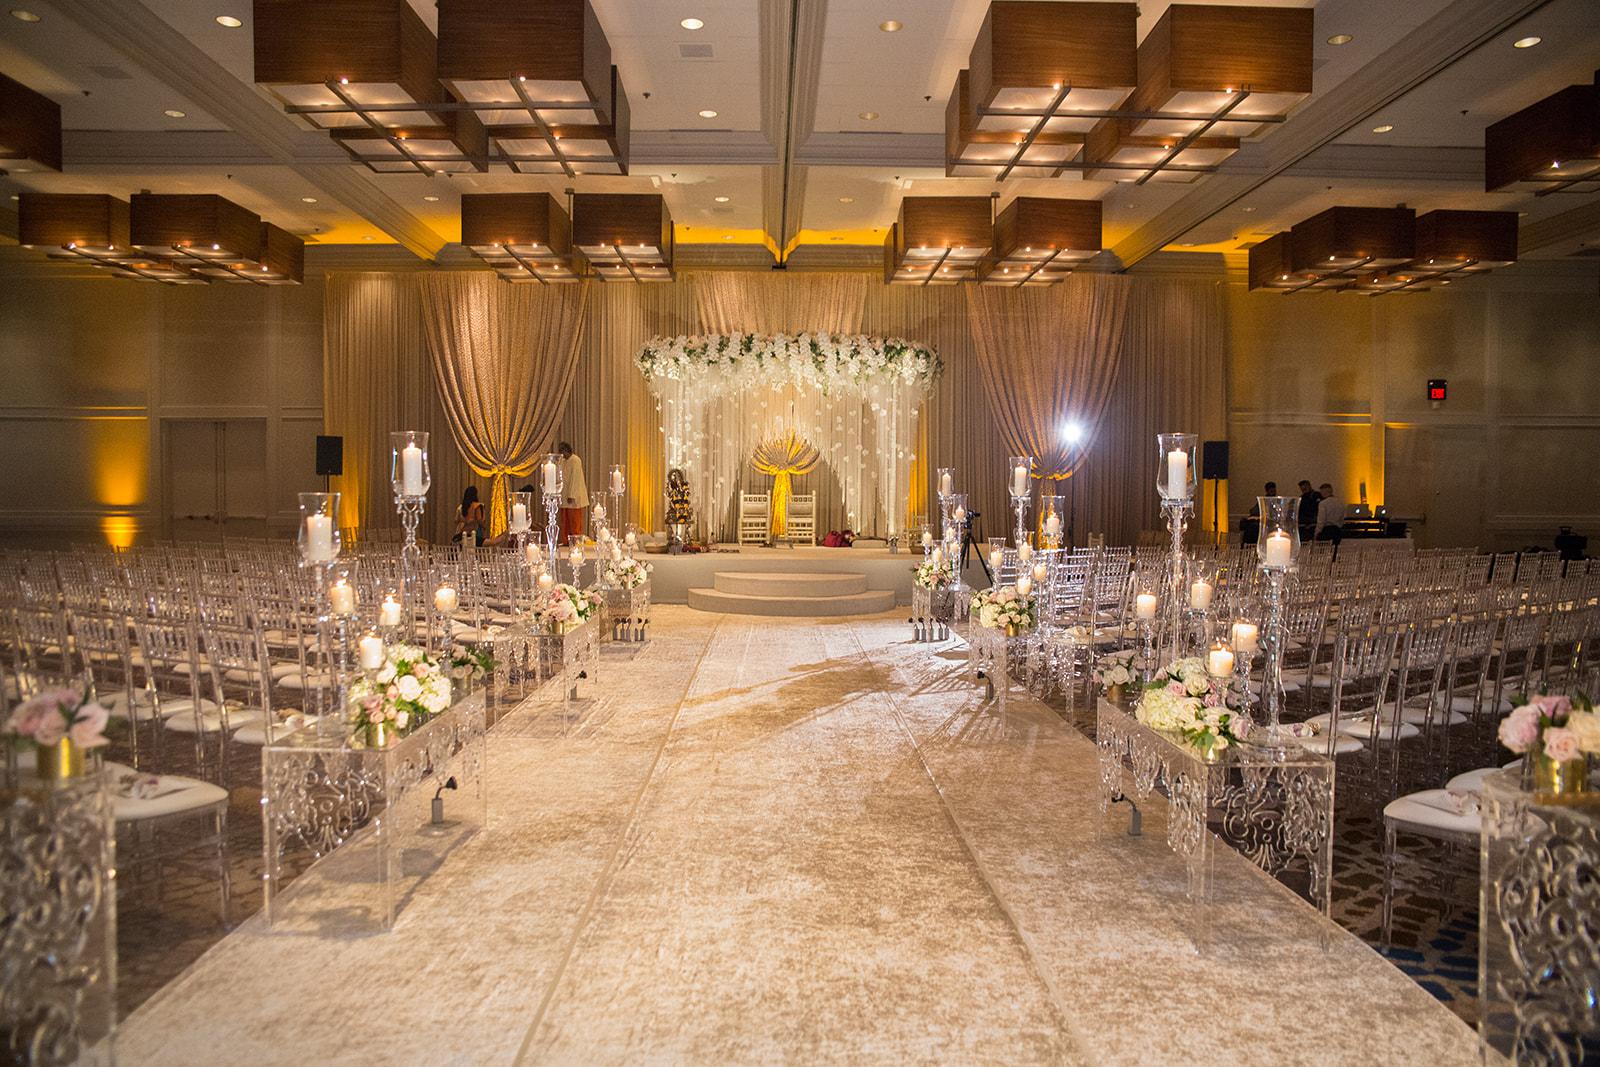 Ceremony Decor - By Yanni Designs